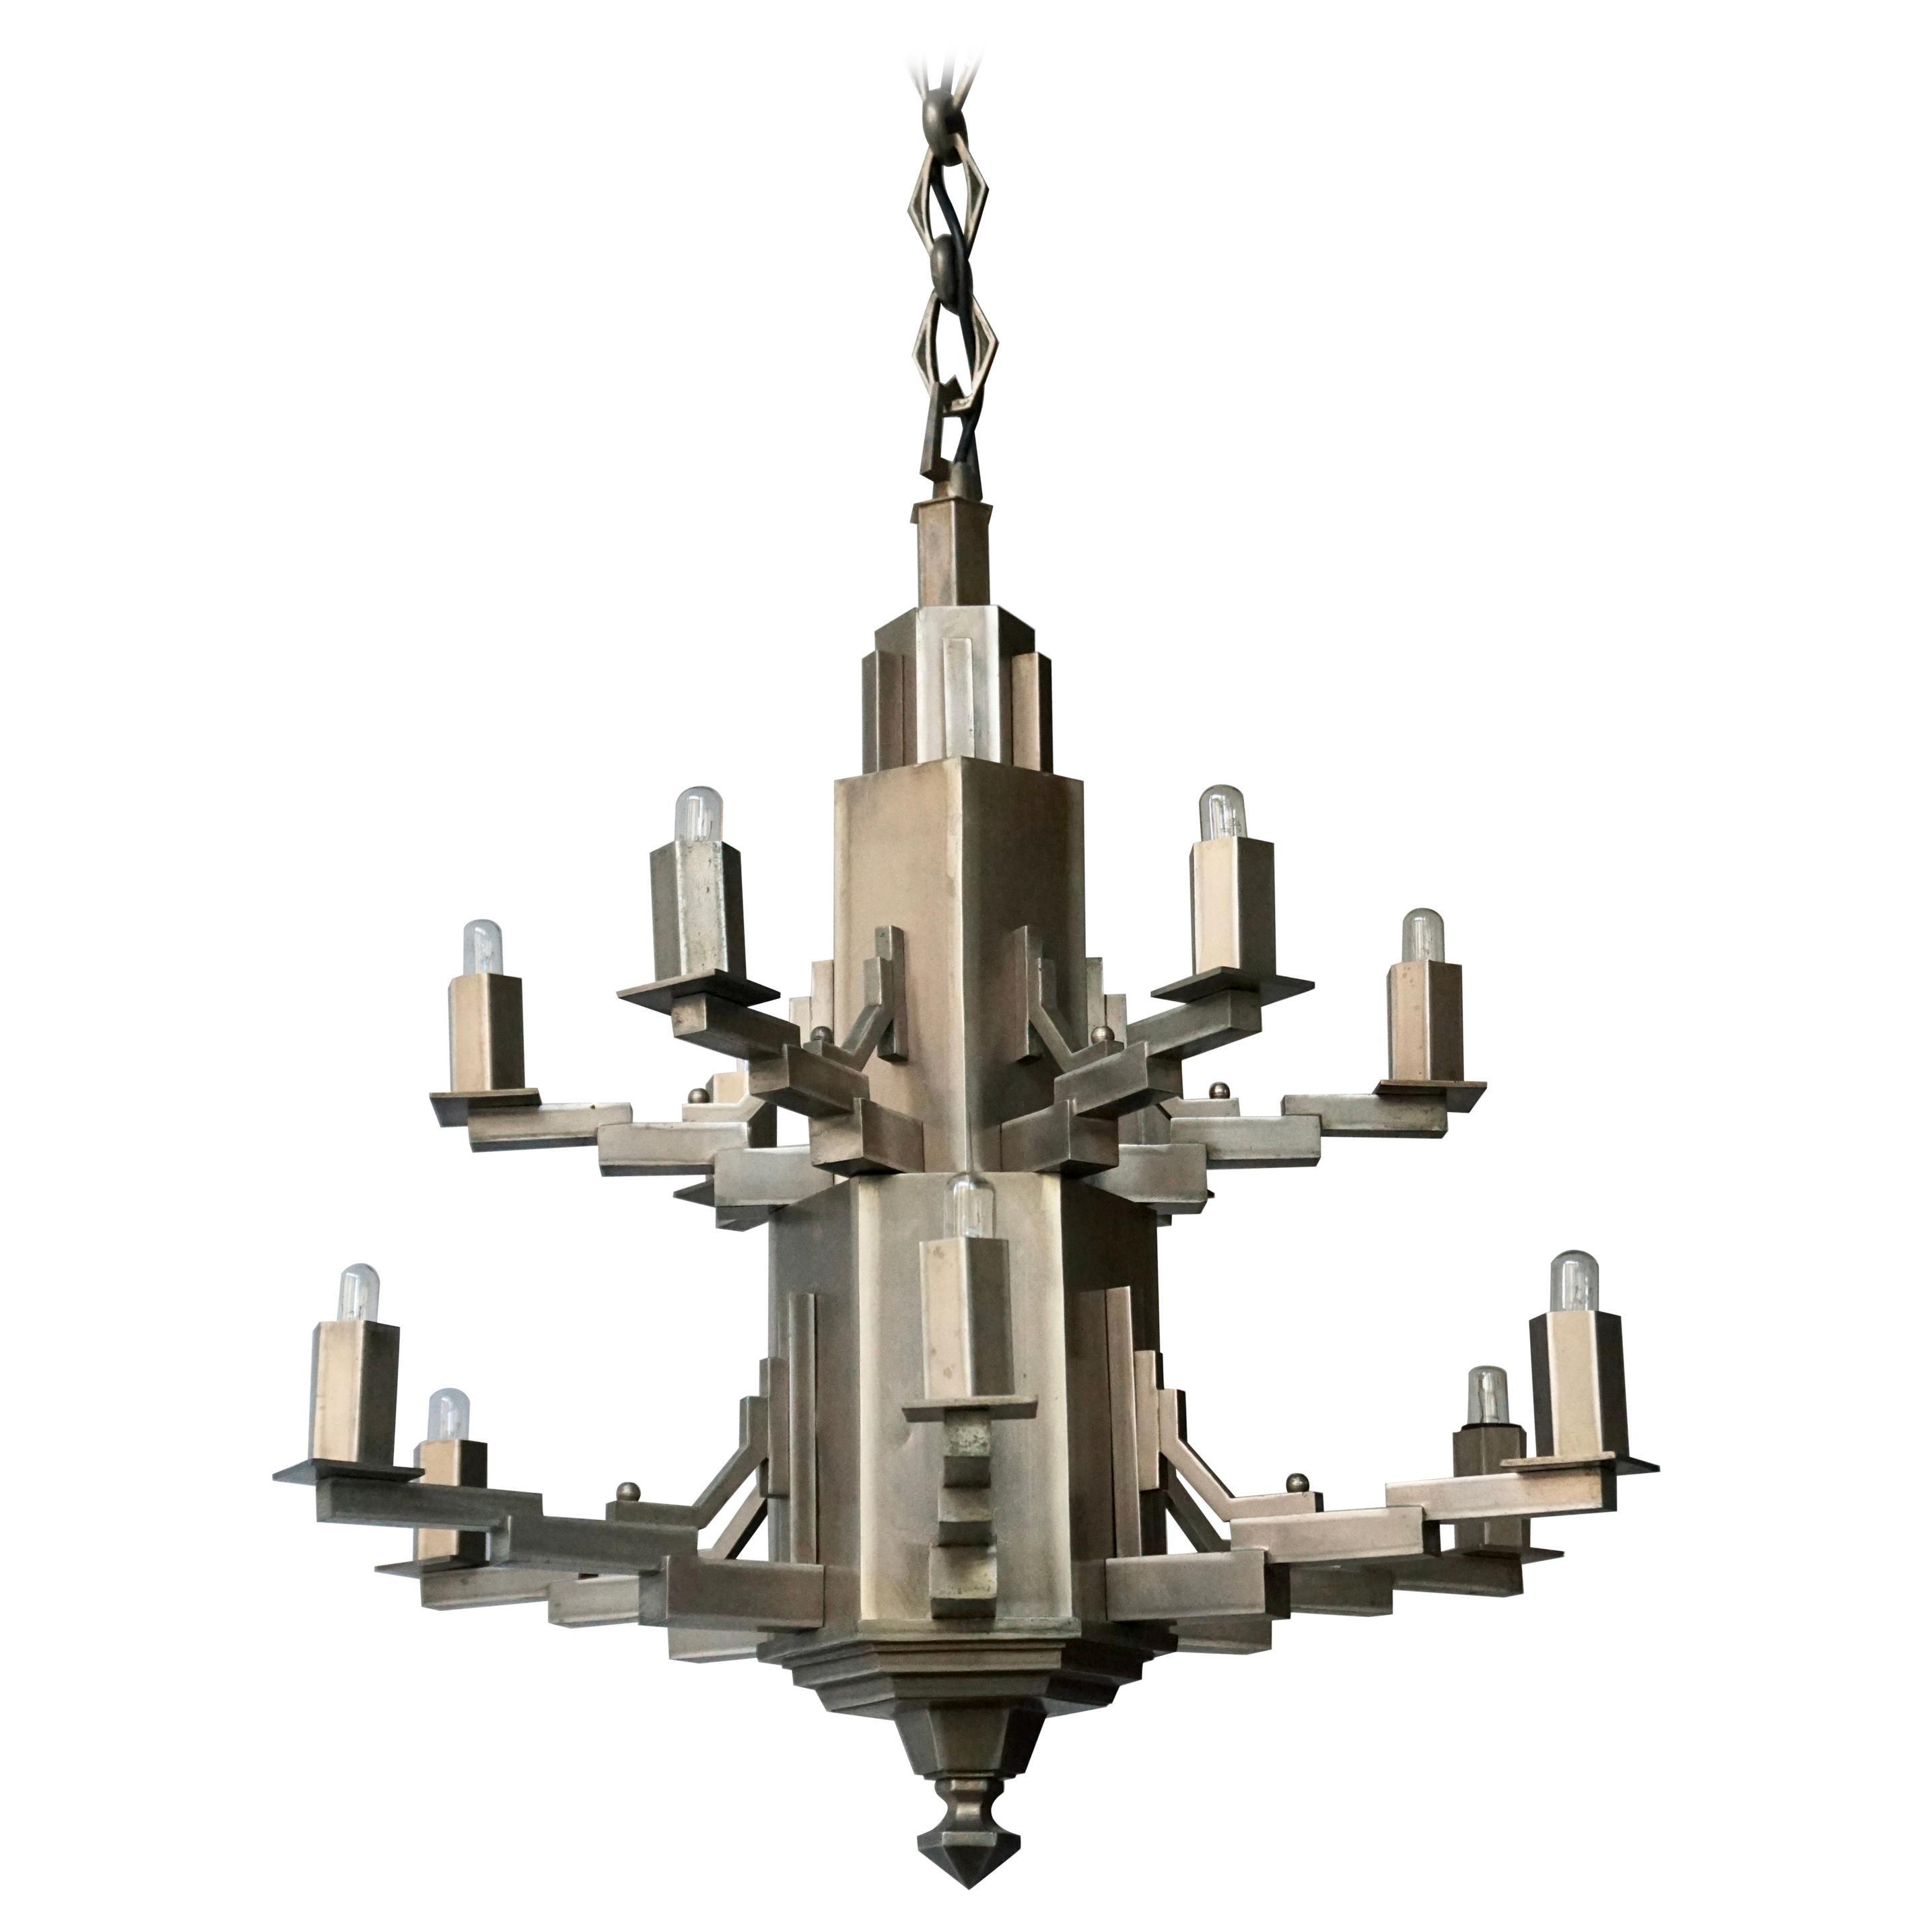 French Art Deco Geometric Tiered Steel Chandelier